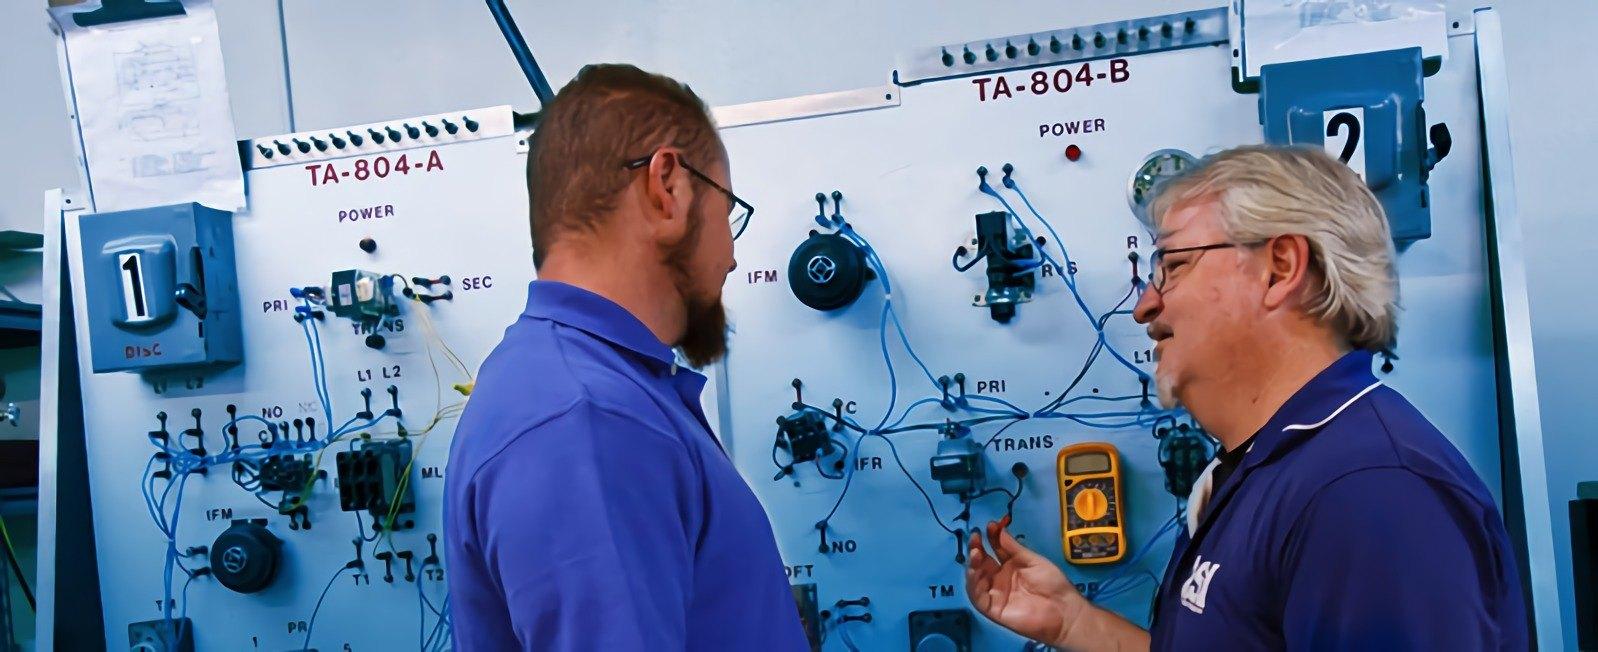 RSI Refrigeration School School Training Phoenix Equipment